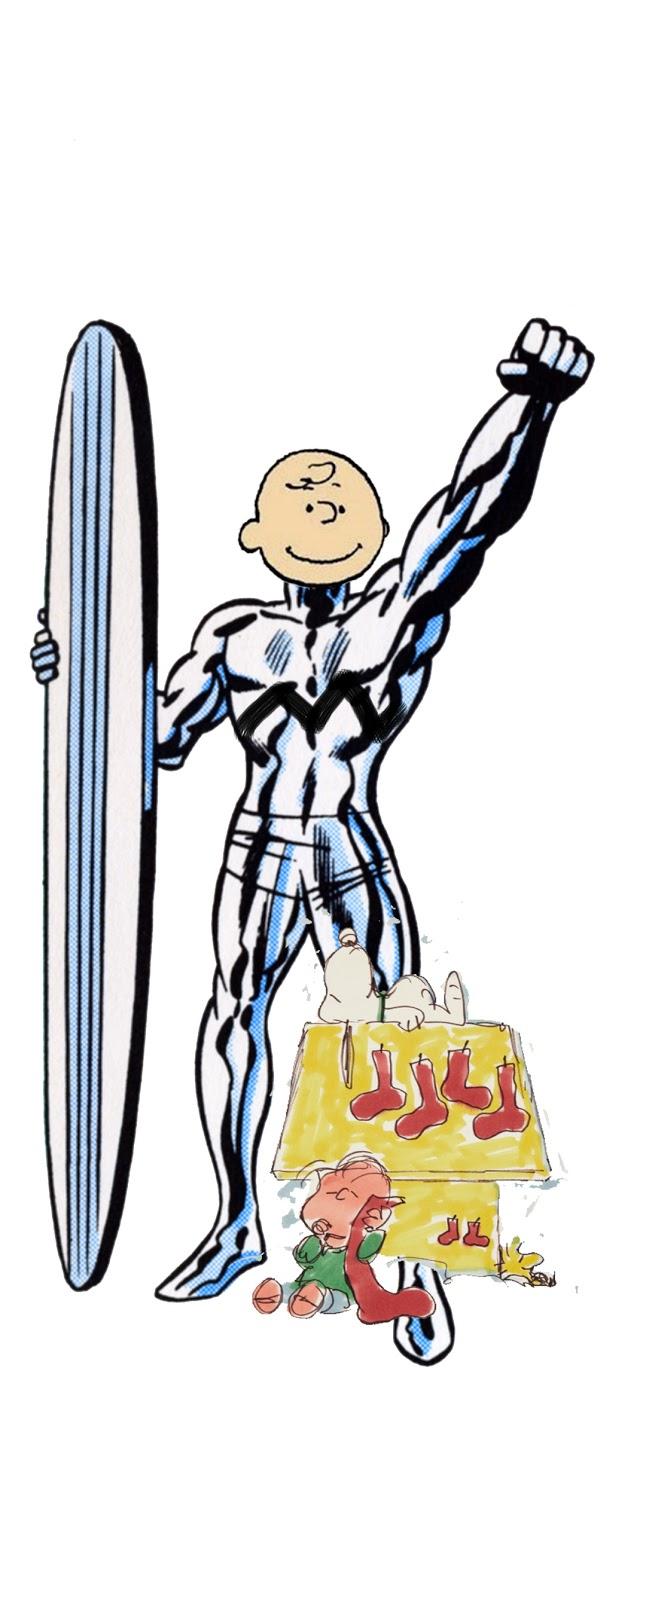 649x1600 Barry's Pearls Comic Book Wisdom Startling Blog